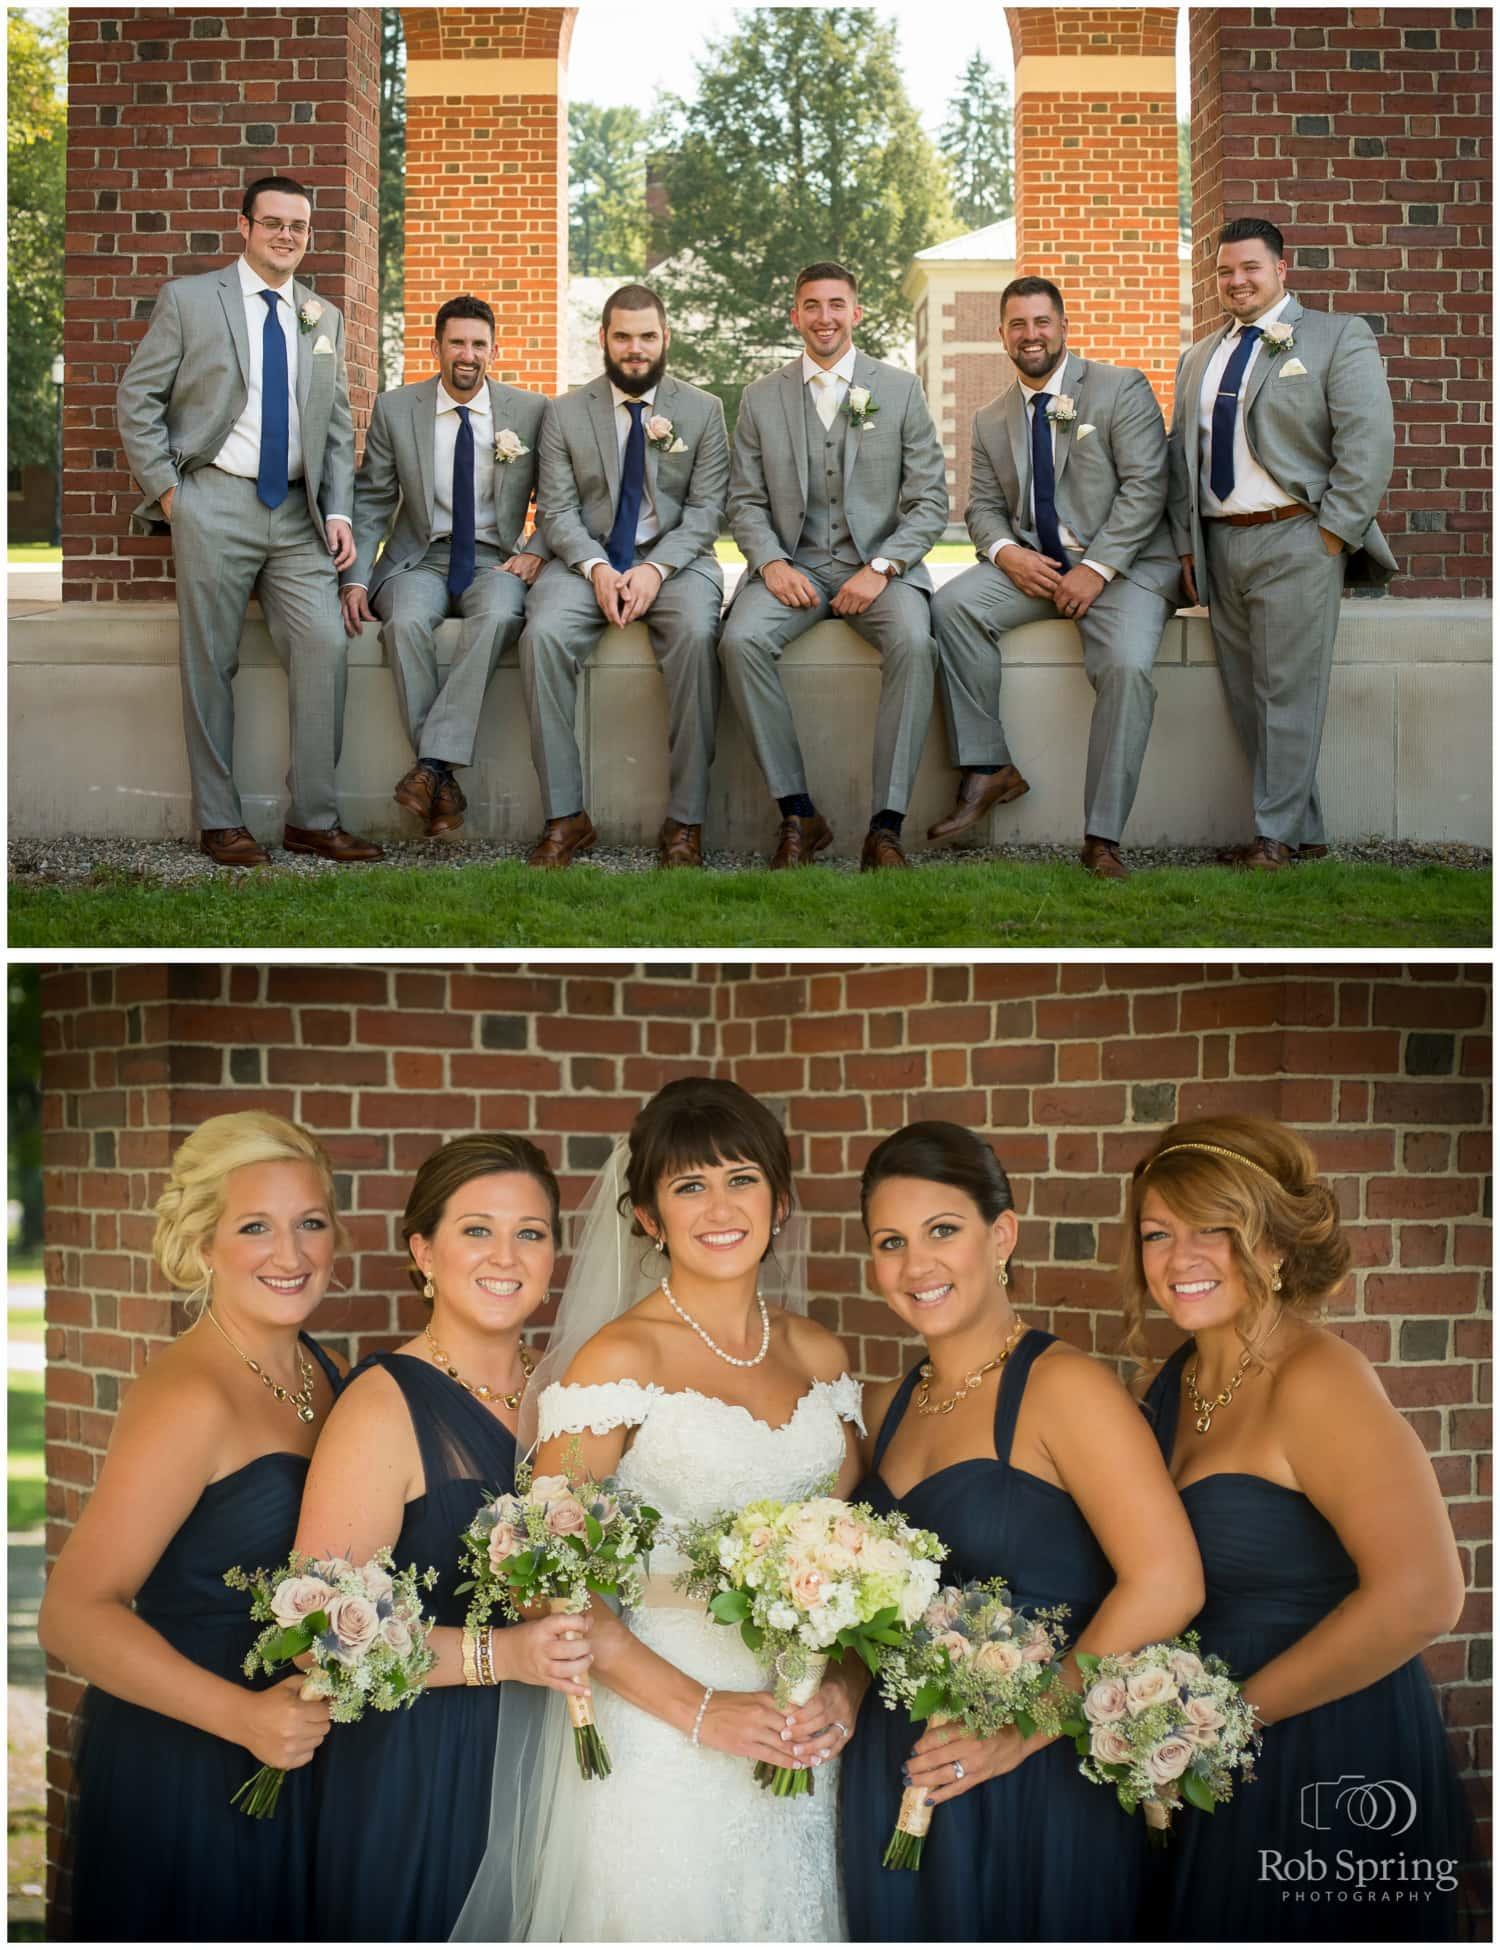 Groomsmen and bridesmaids at Hall of Springs, Saratoga Springs wedding photos